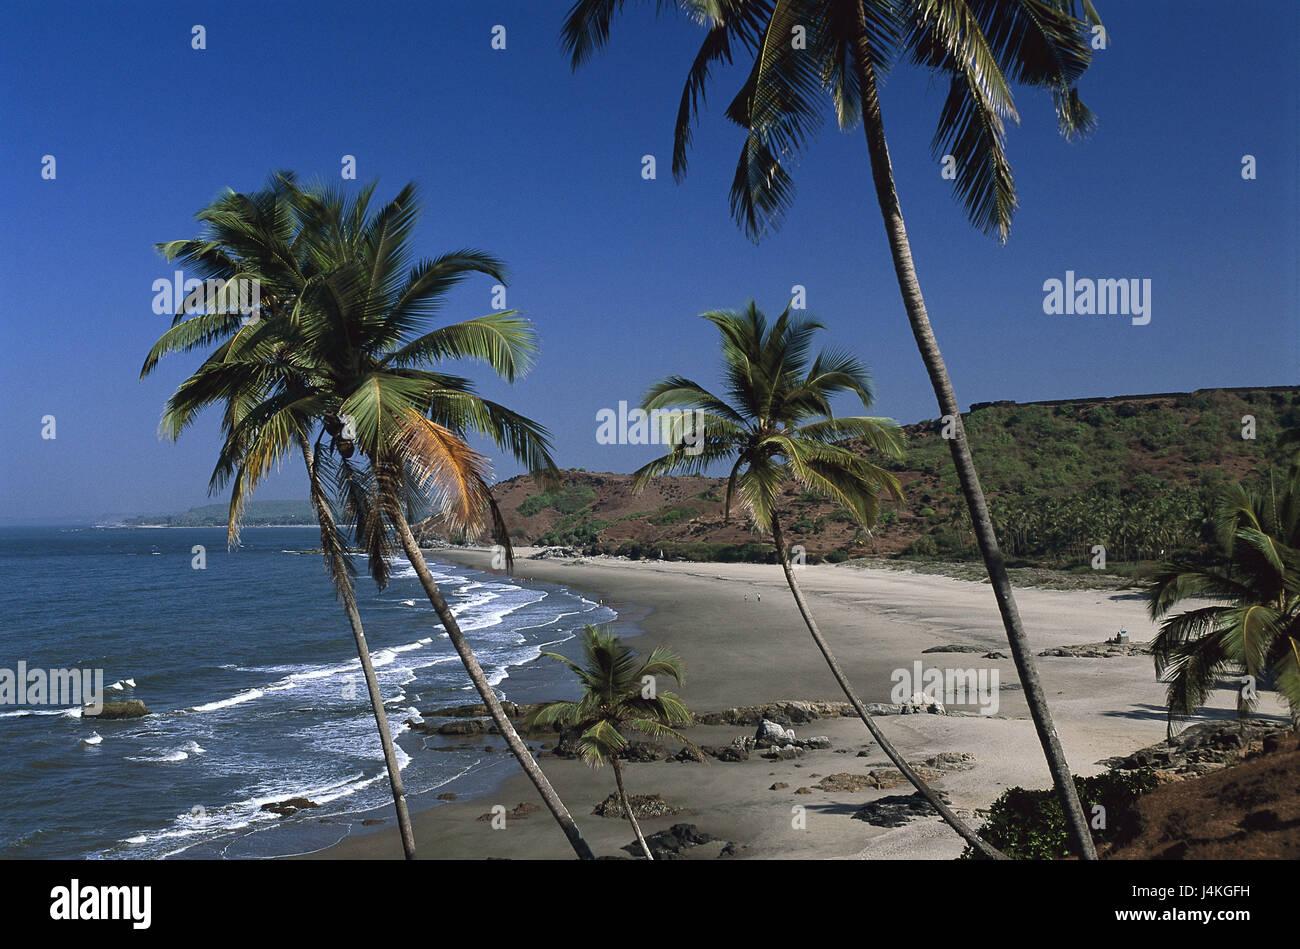 India, Goa, Vafator Beach, beach overview Asia, South Asia